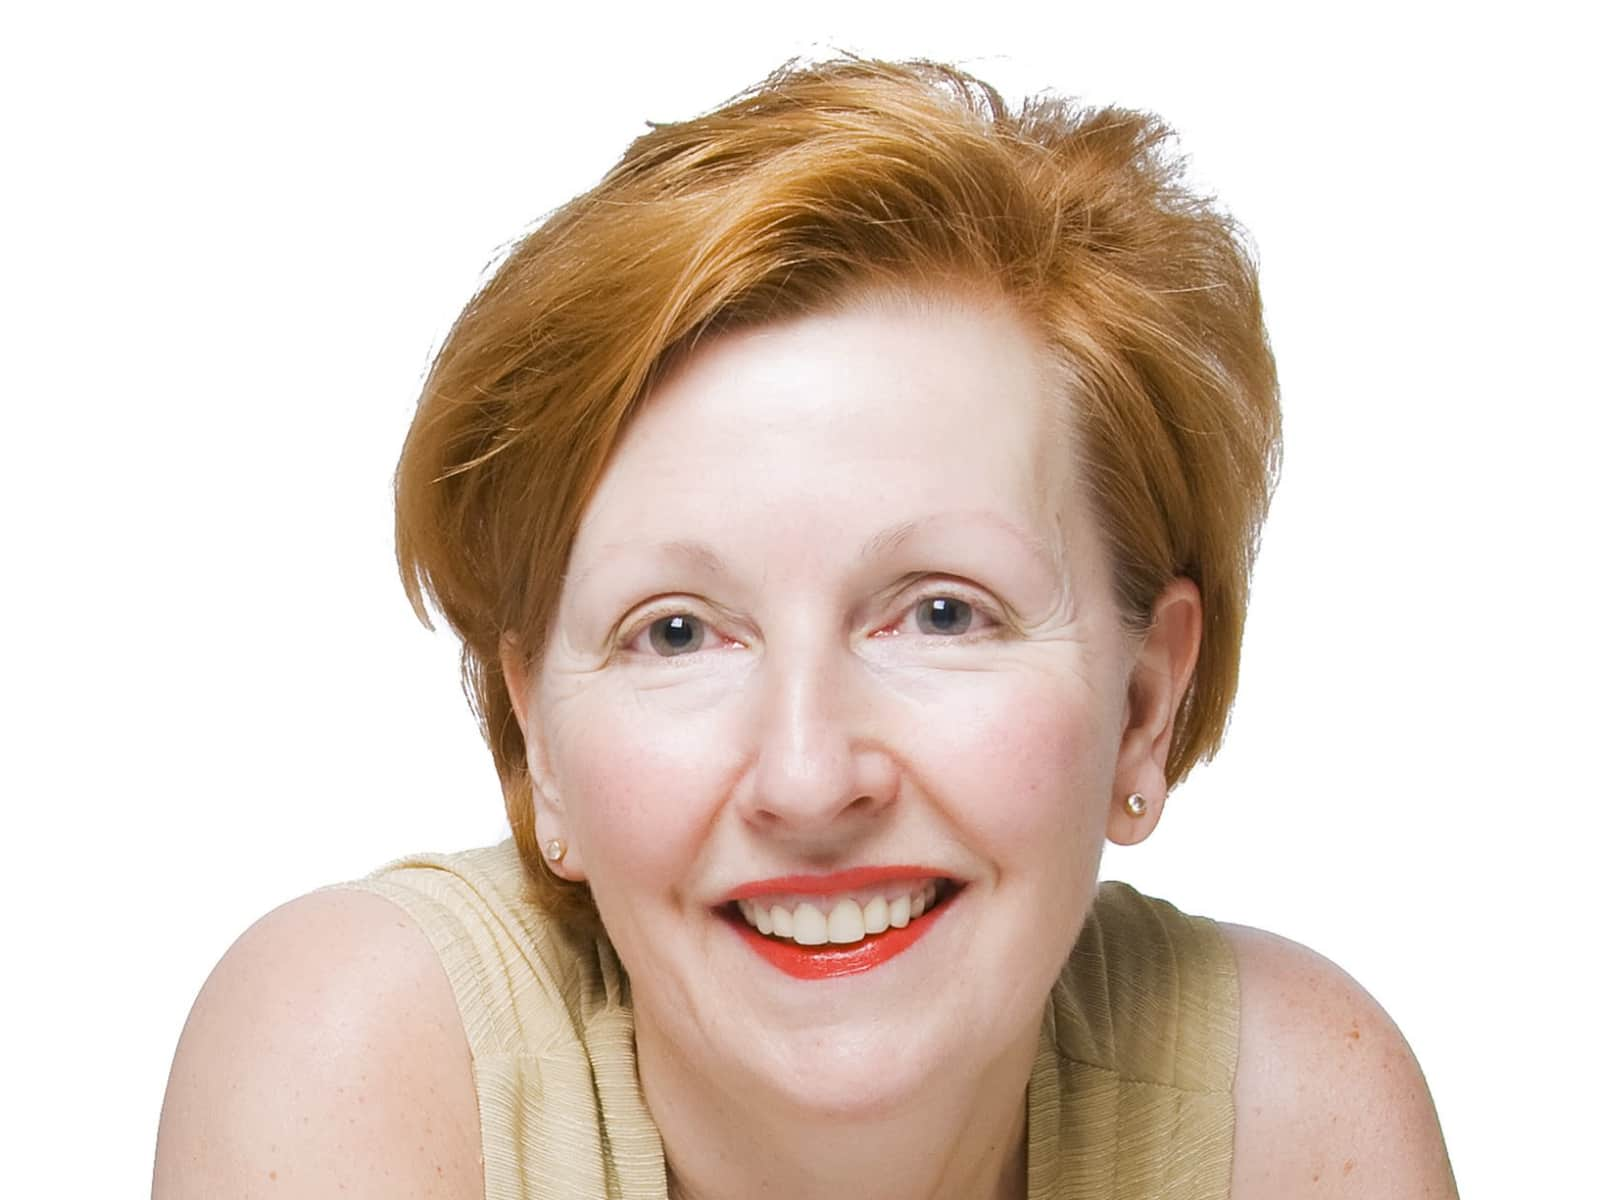 Alison from Edinburgh, United Kingdom